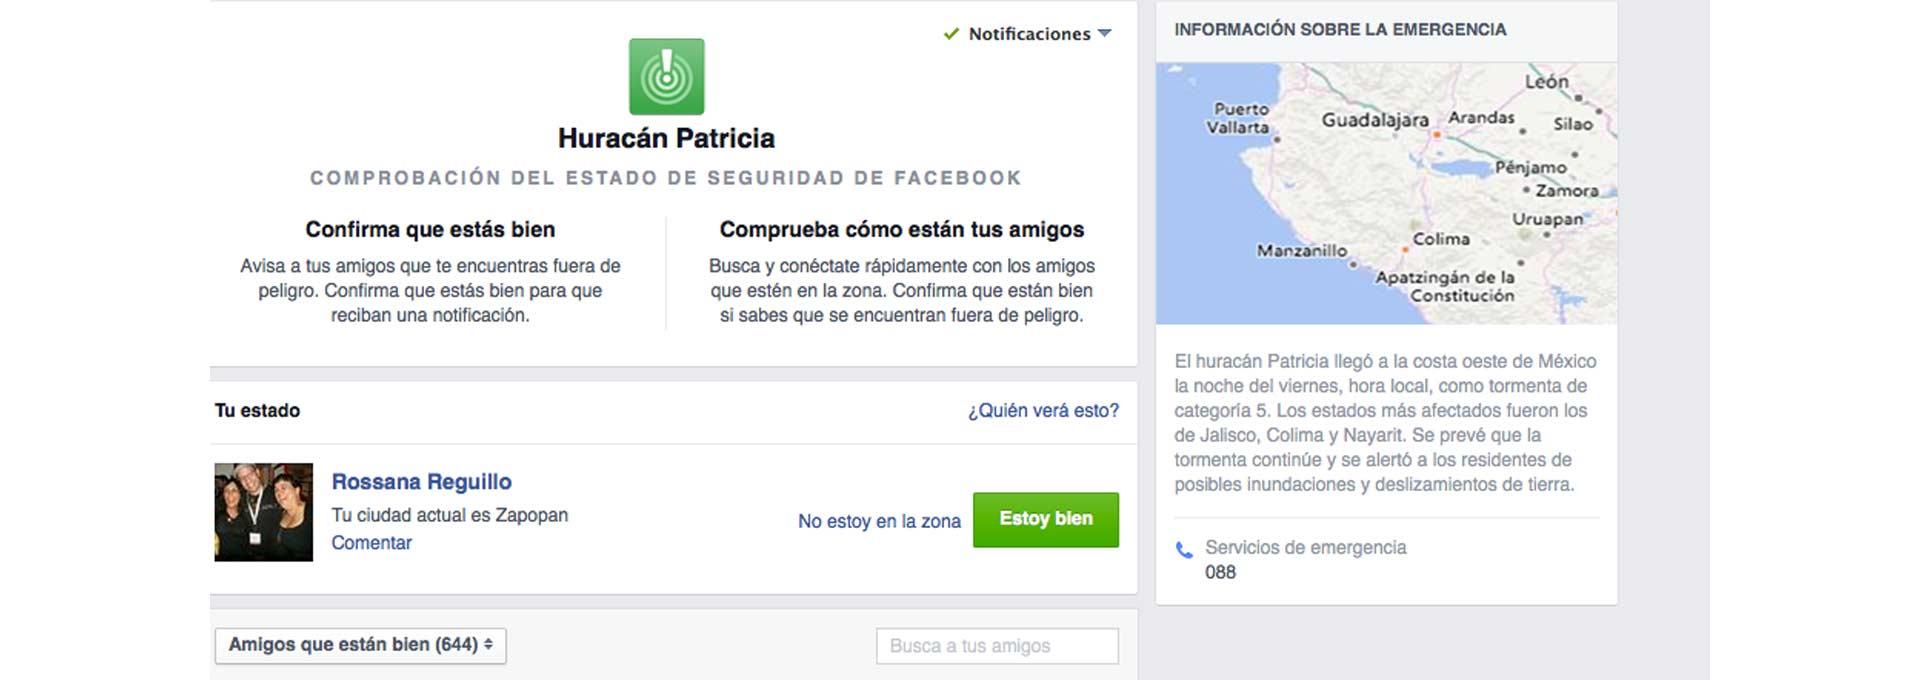 huracan_patricia_caja6